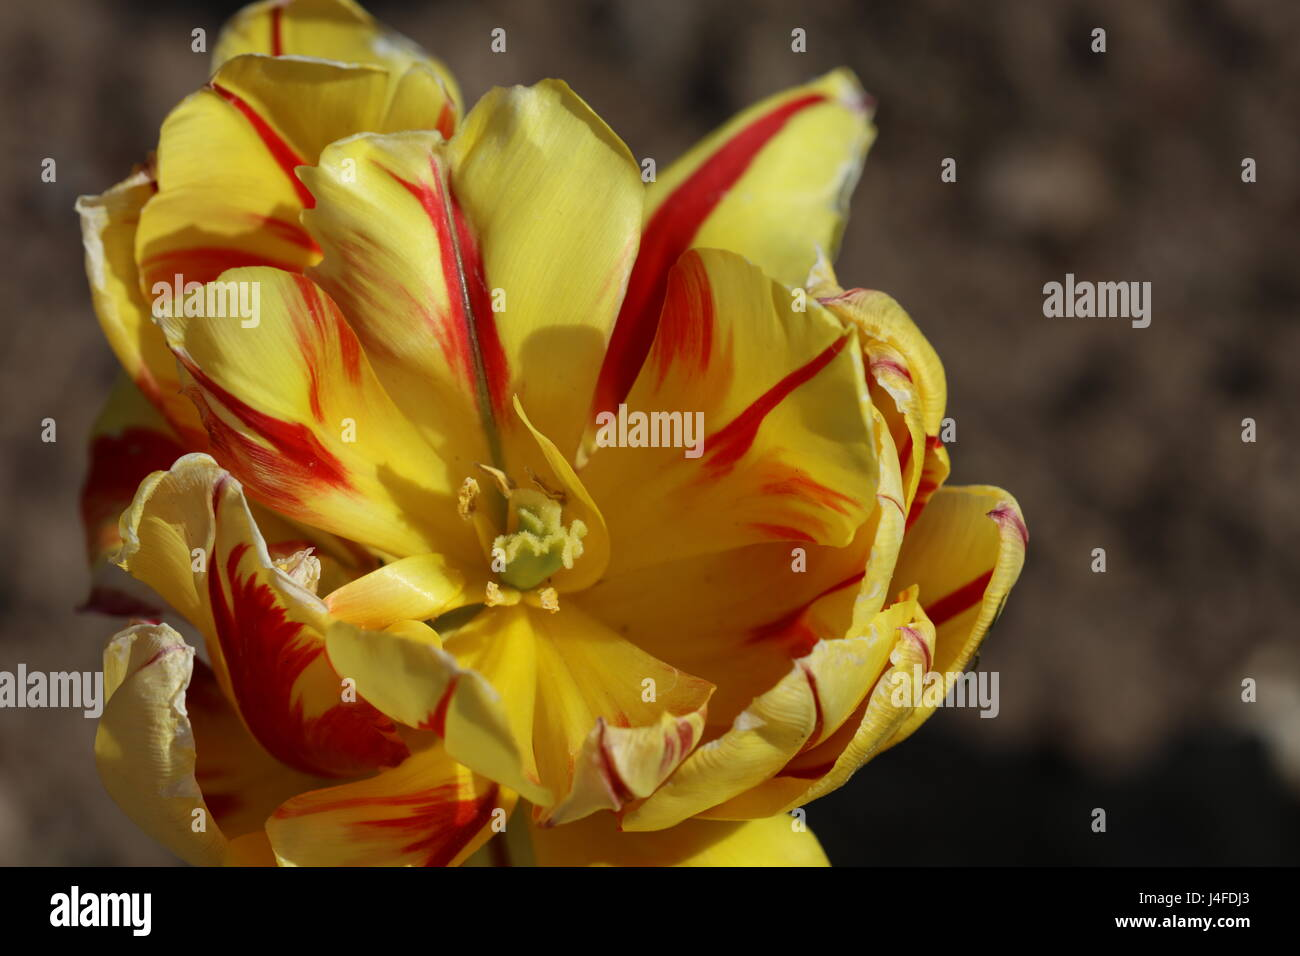 Gelb-rote Tulpe in der Blüte - Stock Image